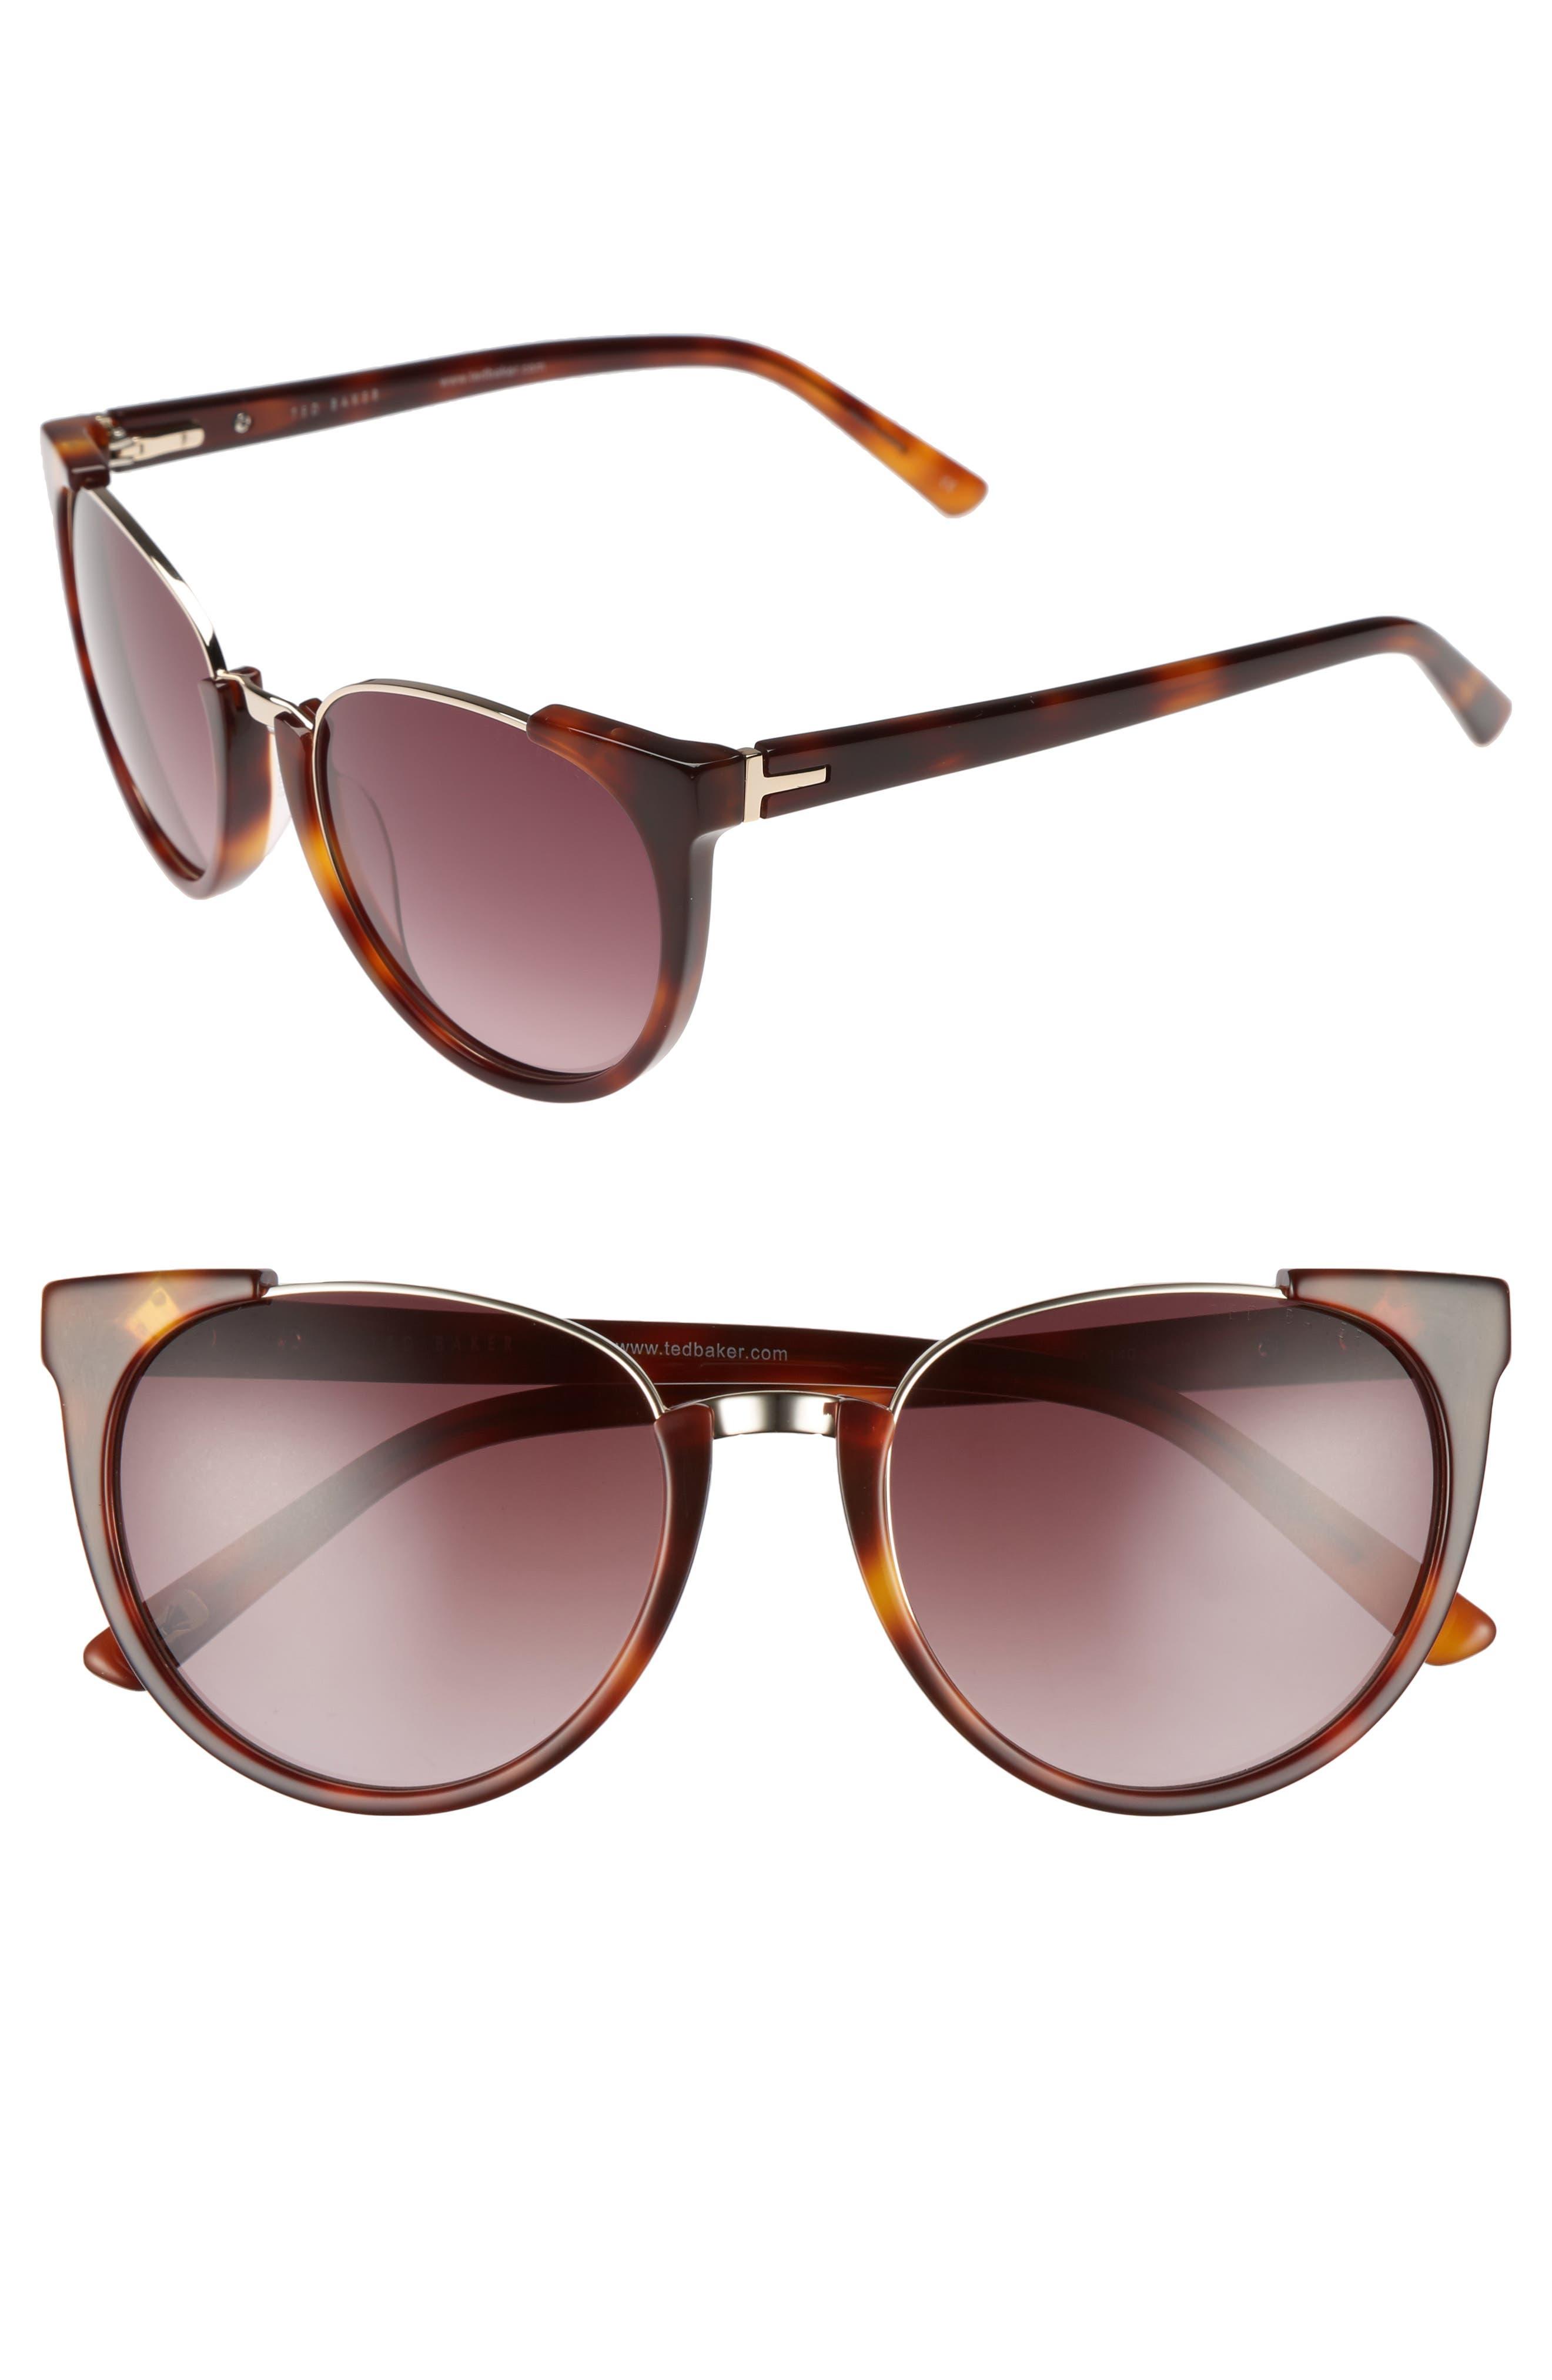 53mm Modified Oval Sunglasses,                             Main thumbnail 1, color,                             200